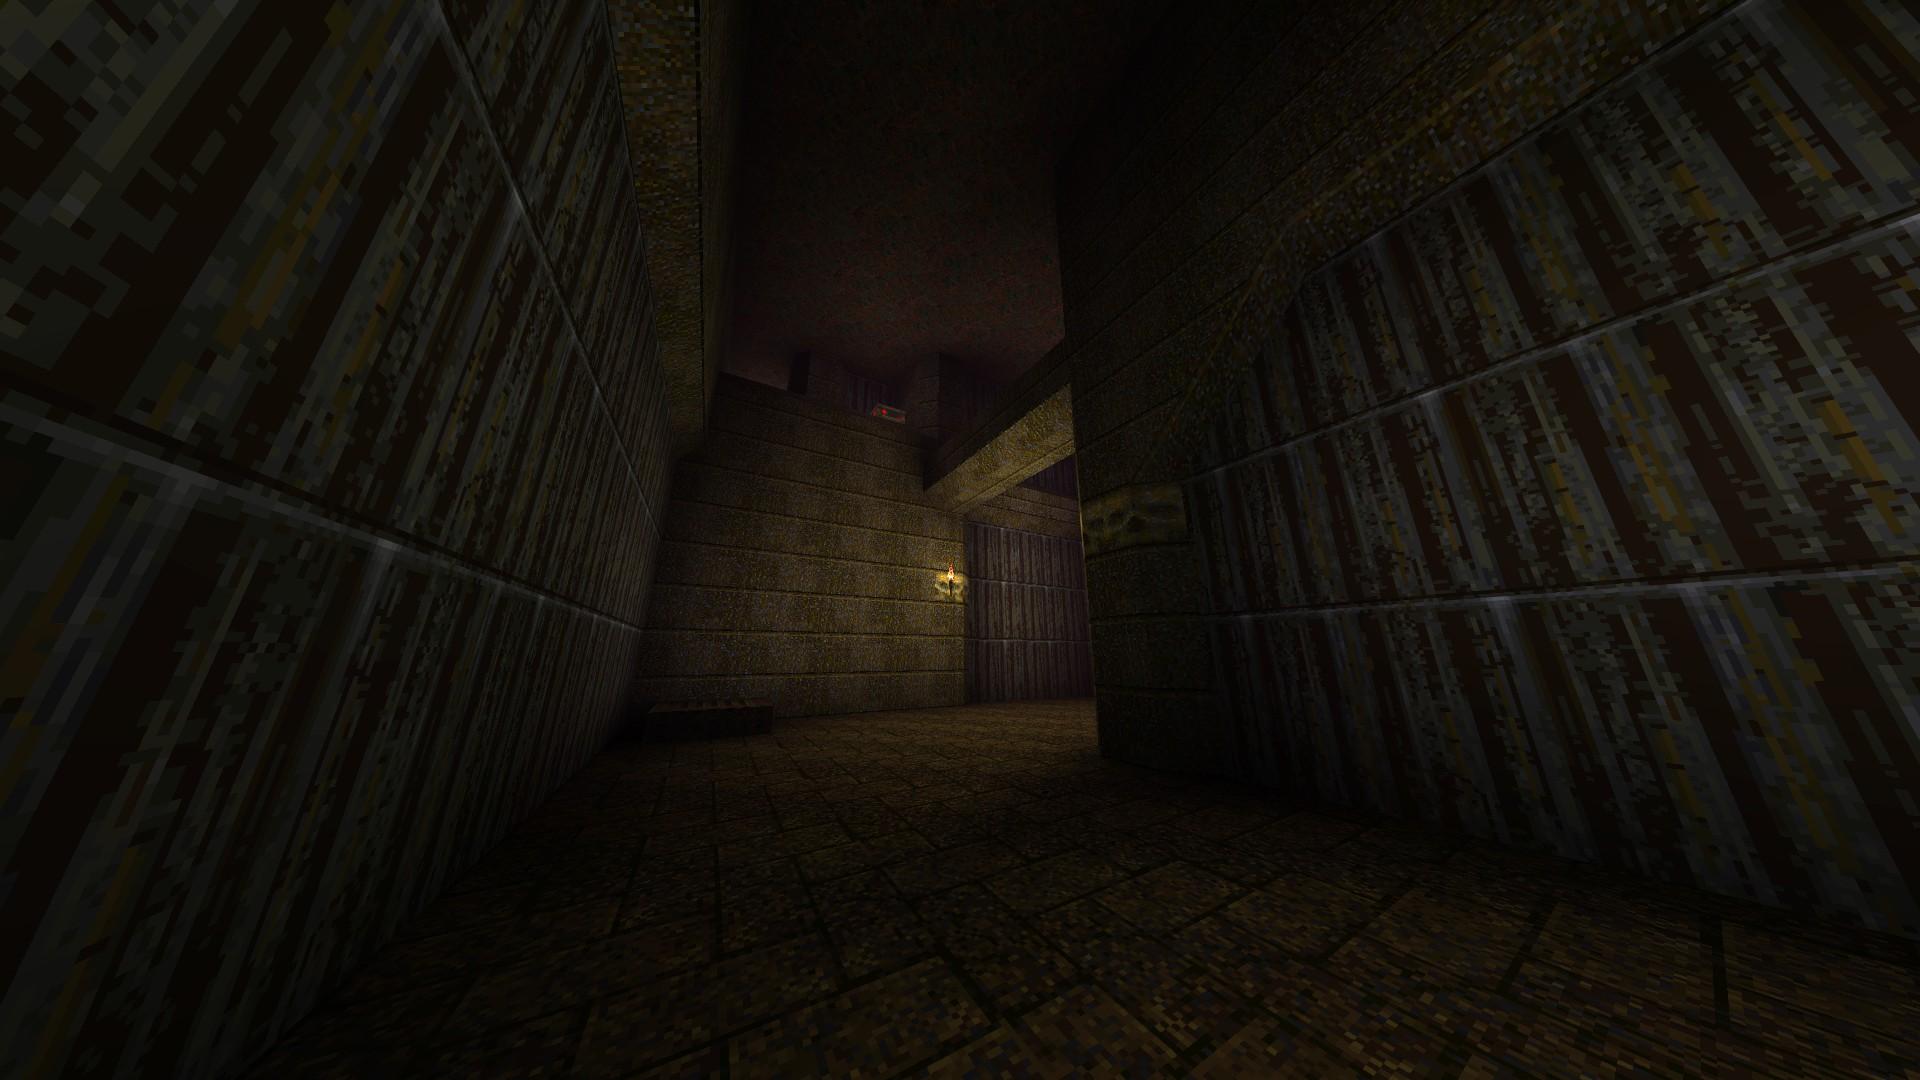 Quake - Locations of All Secrets in Game Tips - E2: Dominion of Darkness - Part II - CD4E11B